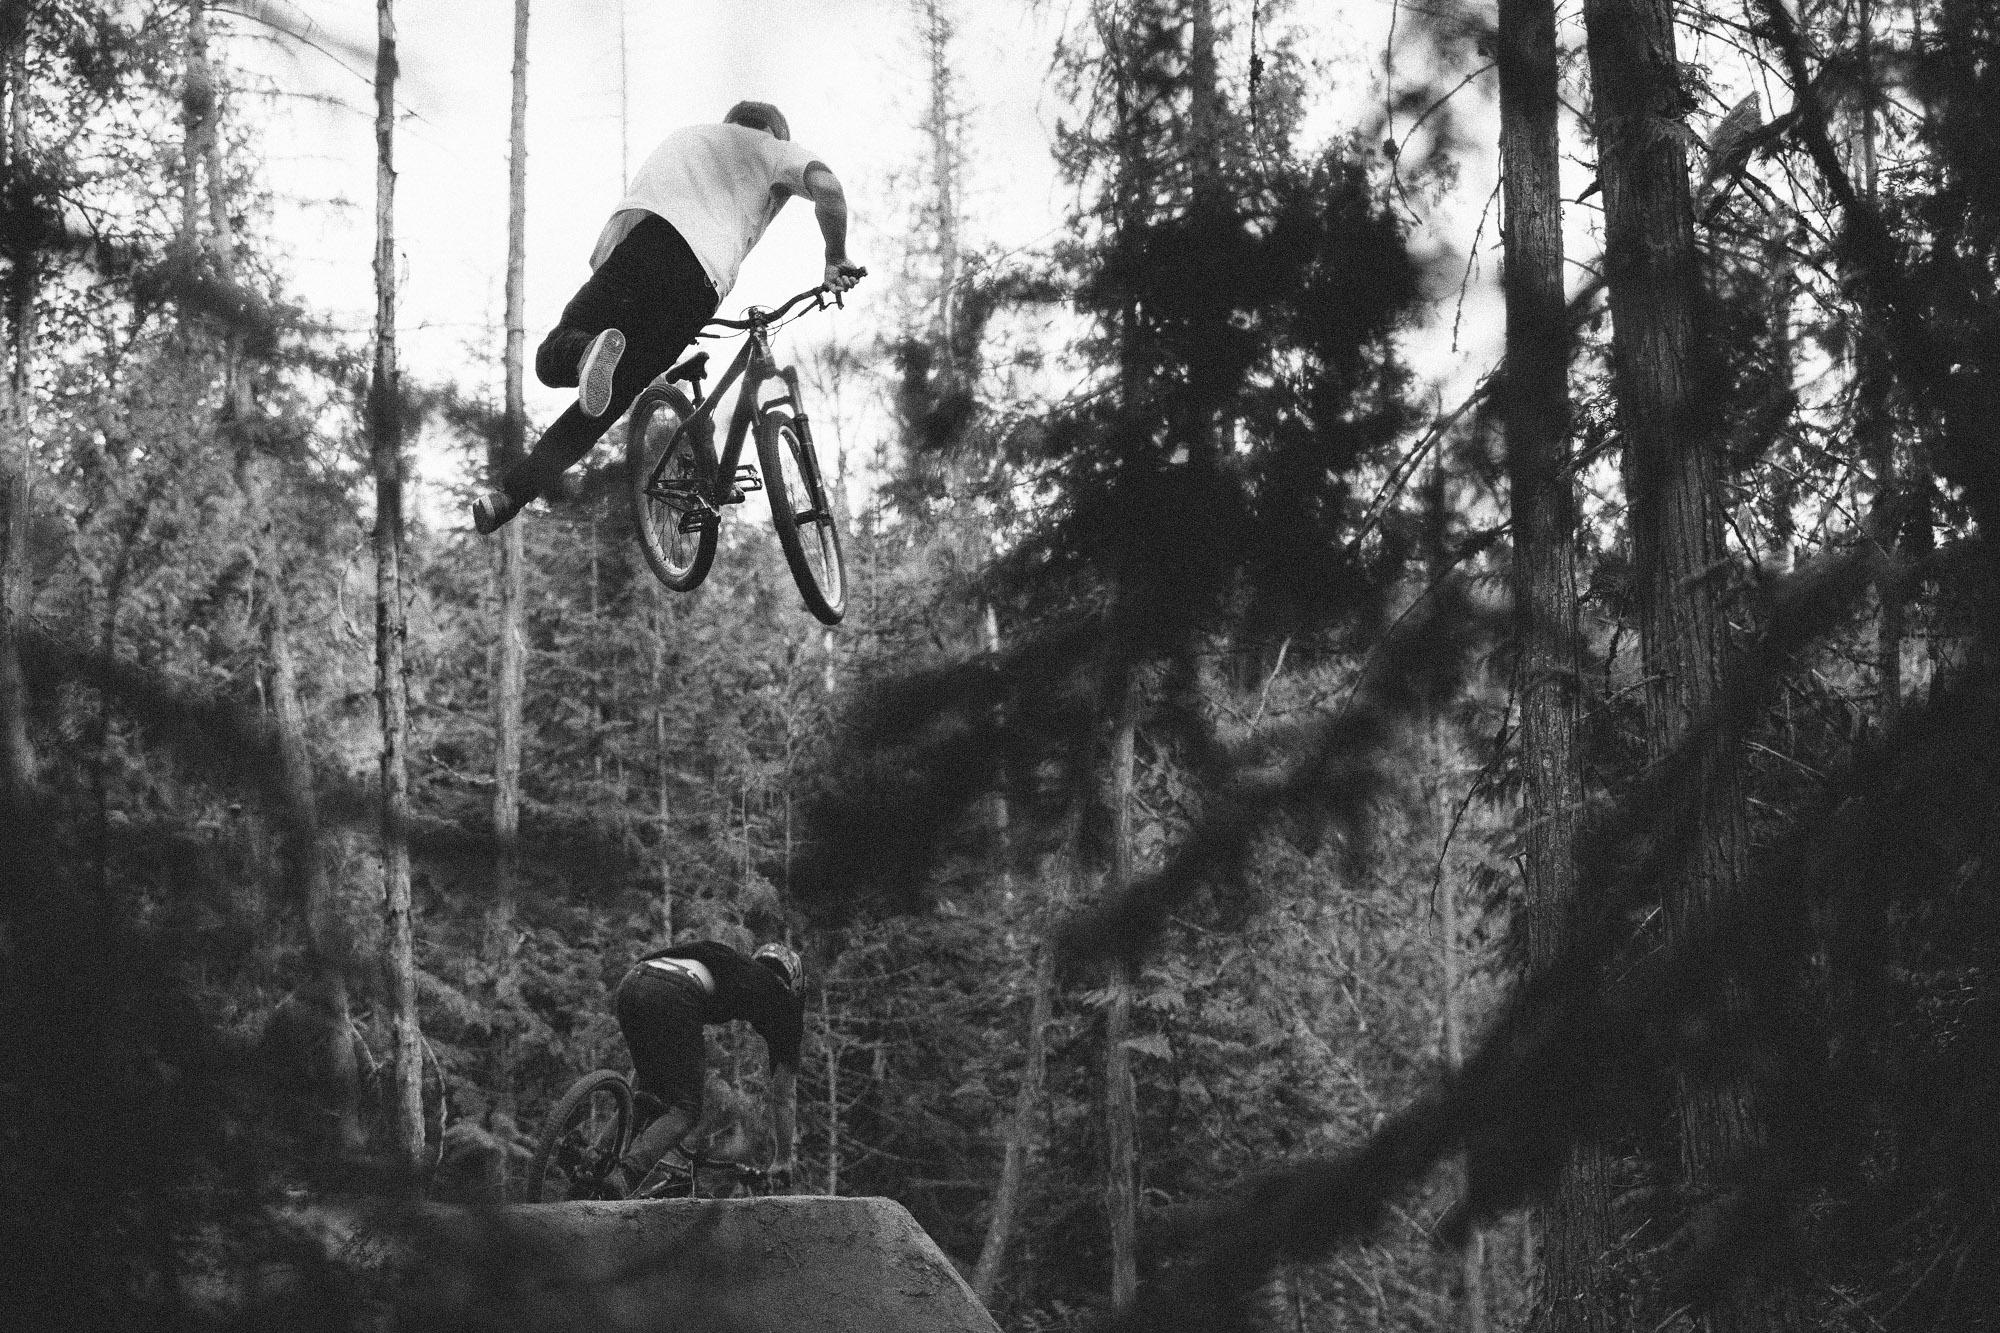 Slalom track Vernon with Bas van Steenbergen - Photo: Robb Thompson Photo